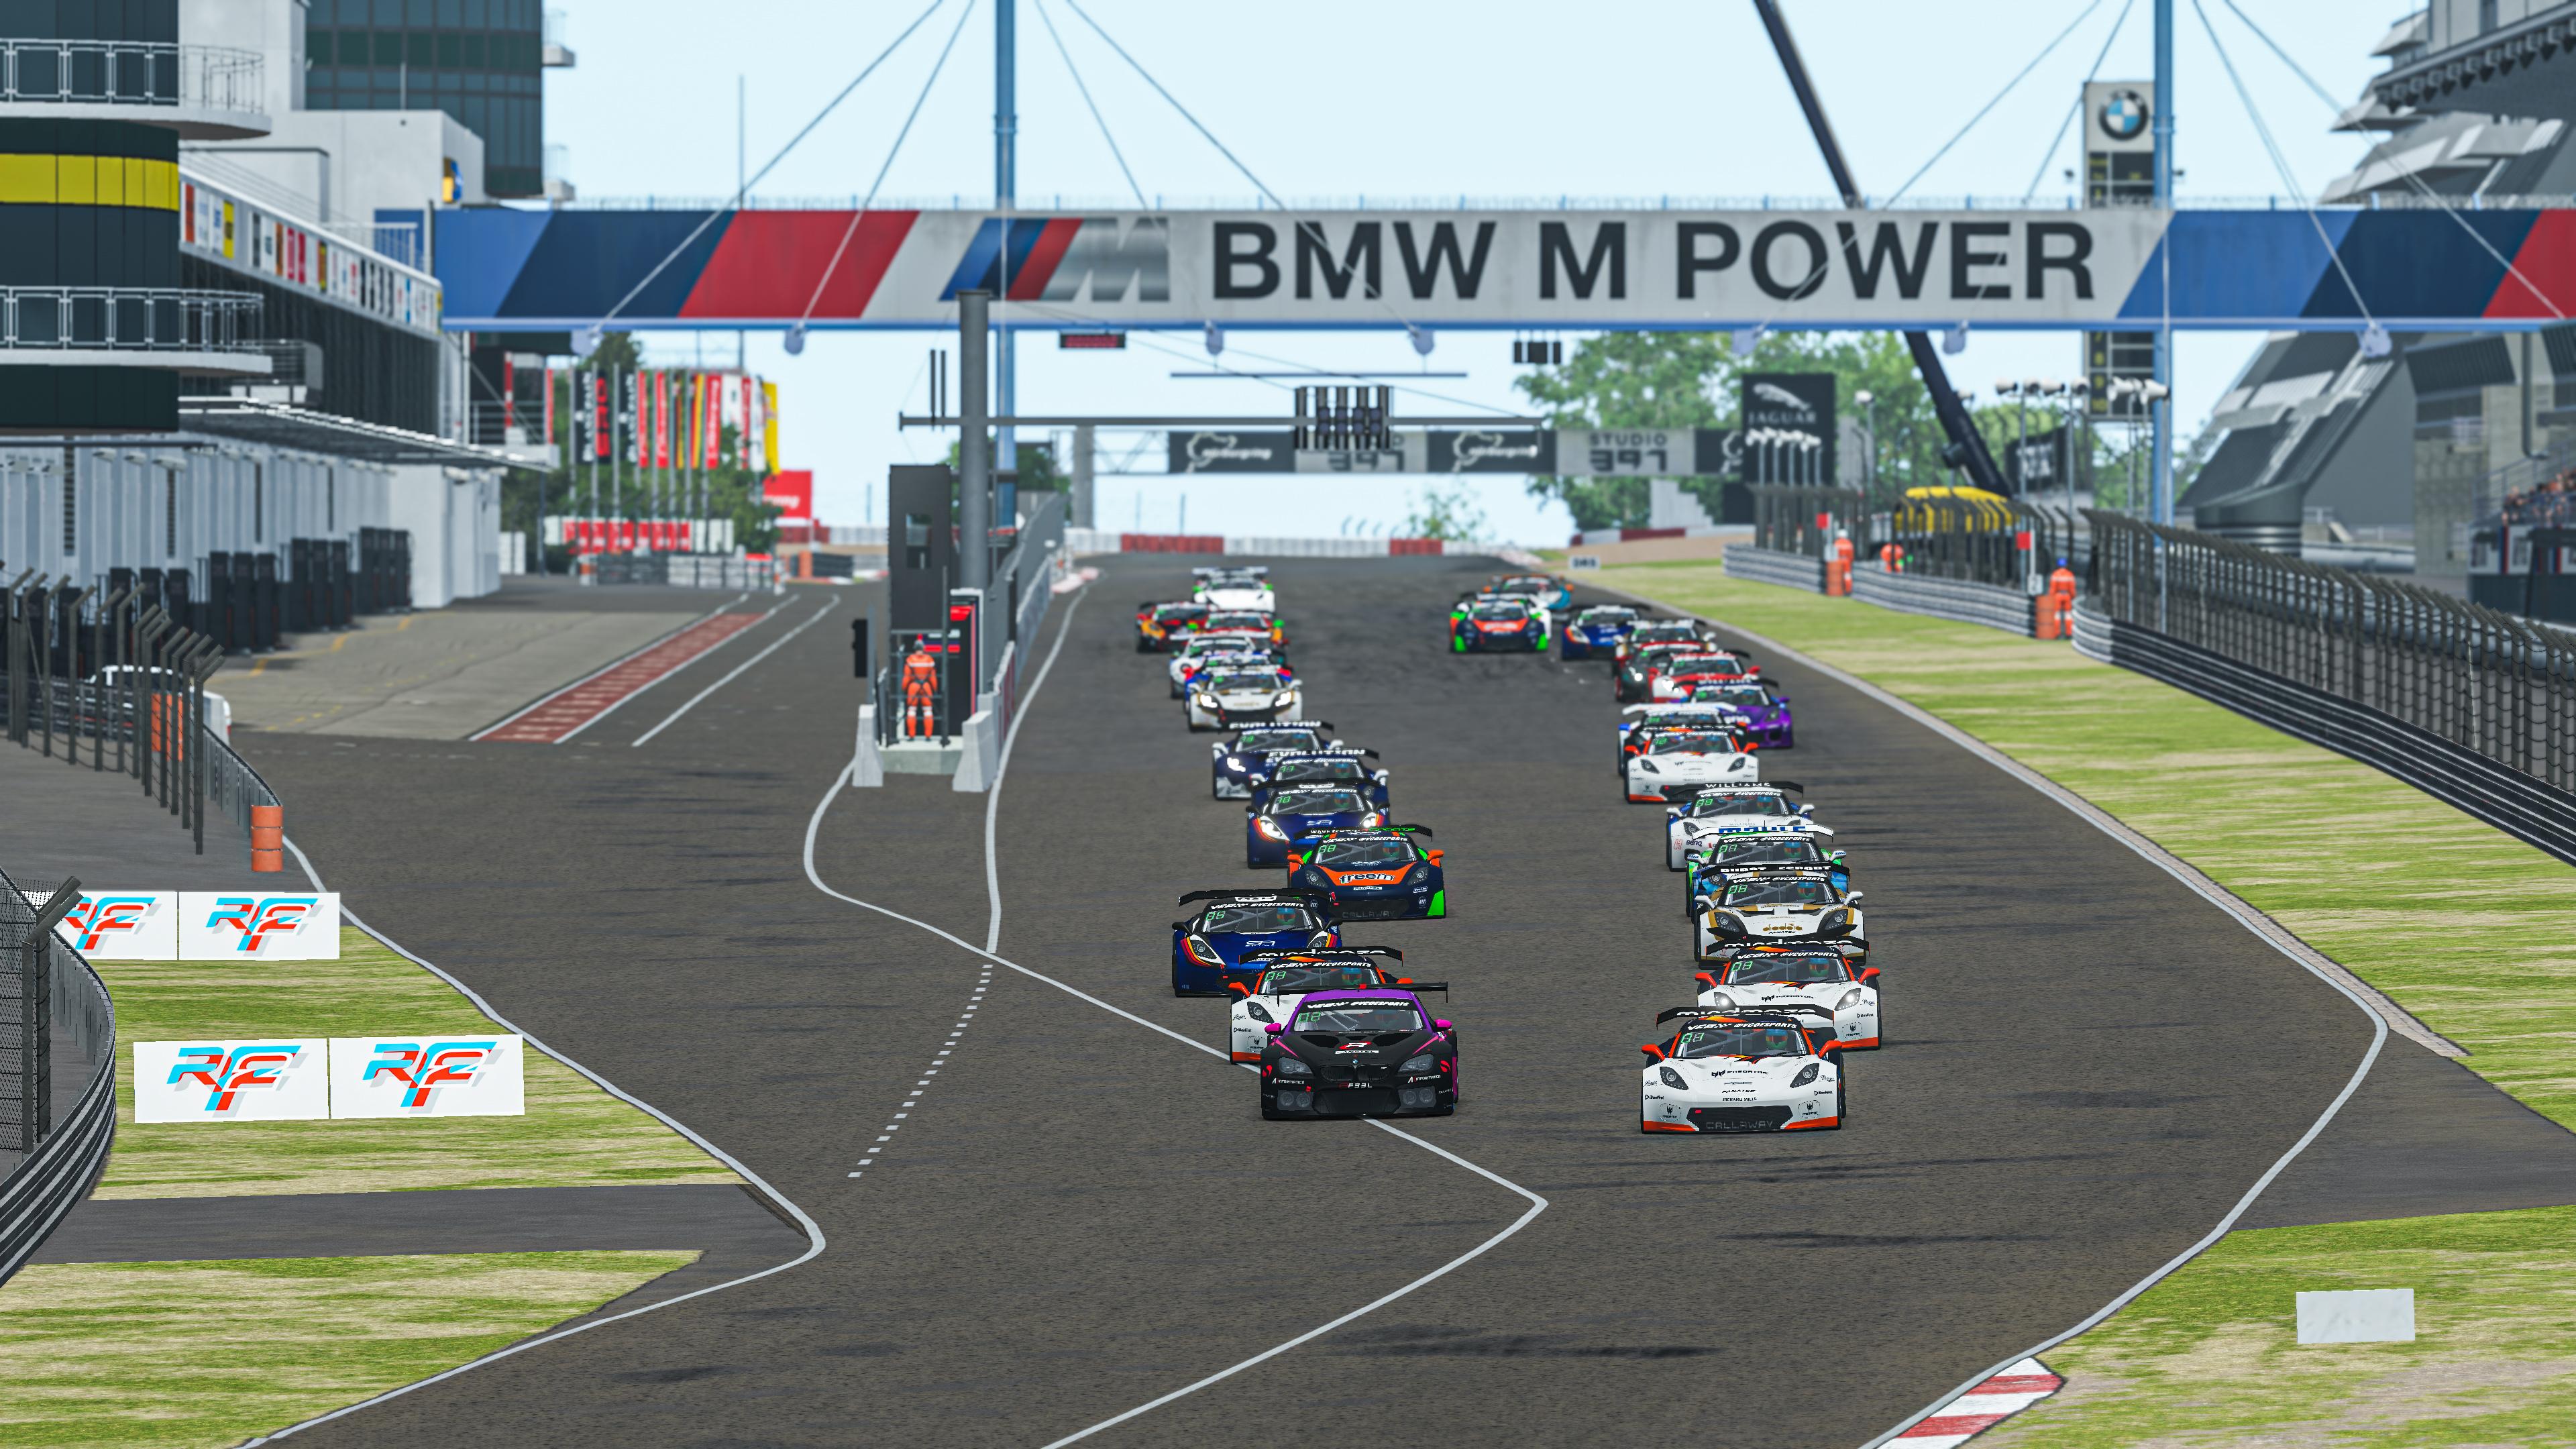 Gt Pro S2 R4 Sprint Race Start Pic 2